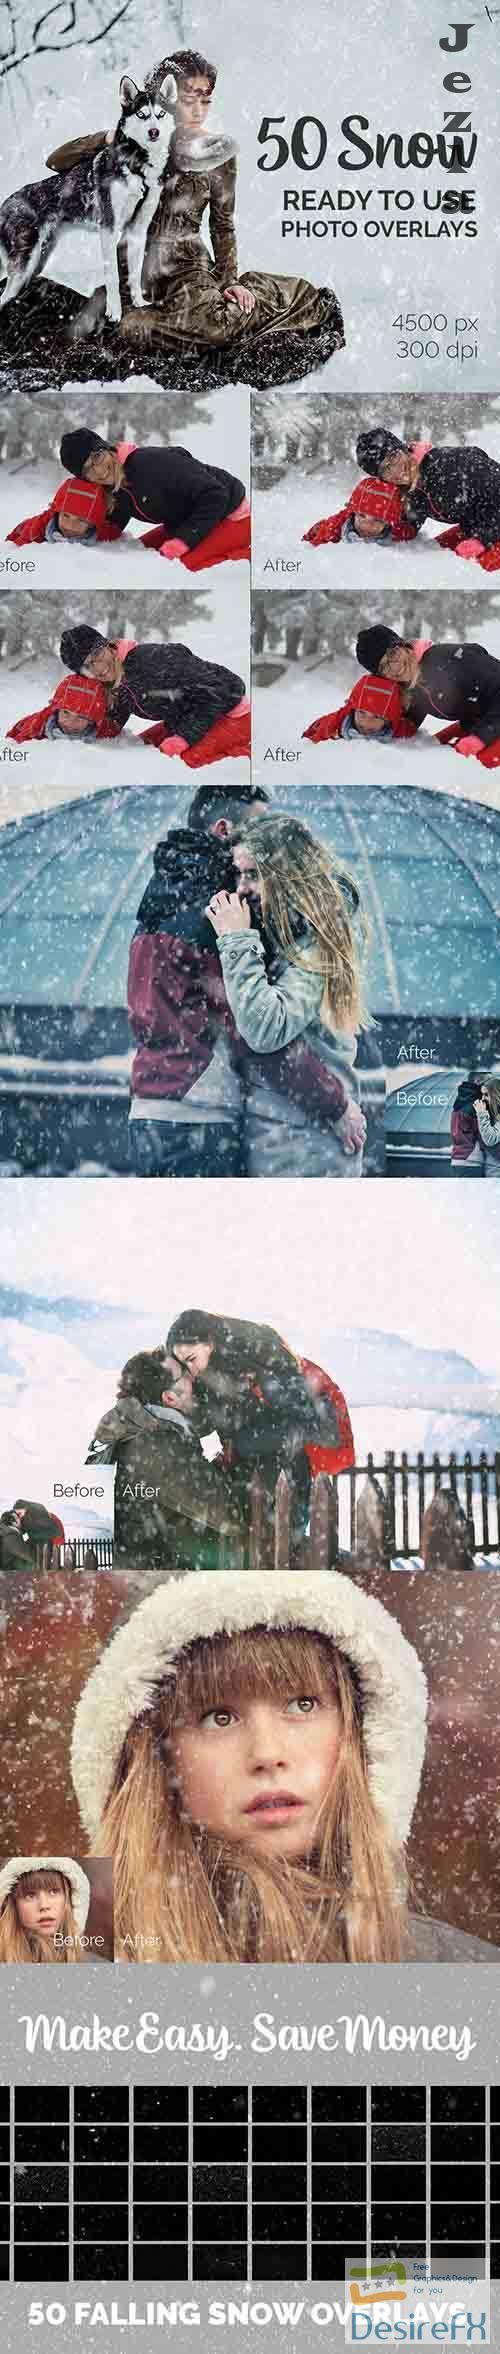 50 Falling Snow Photo Overlays  - 27017662